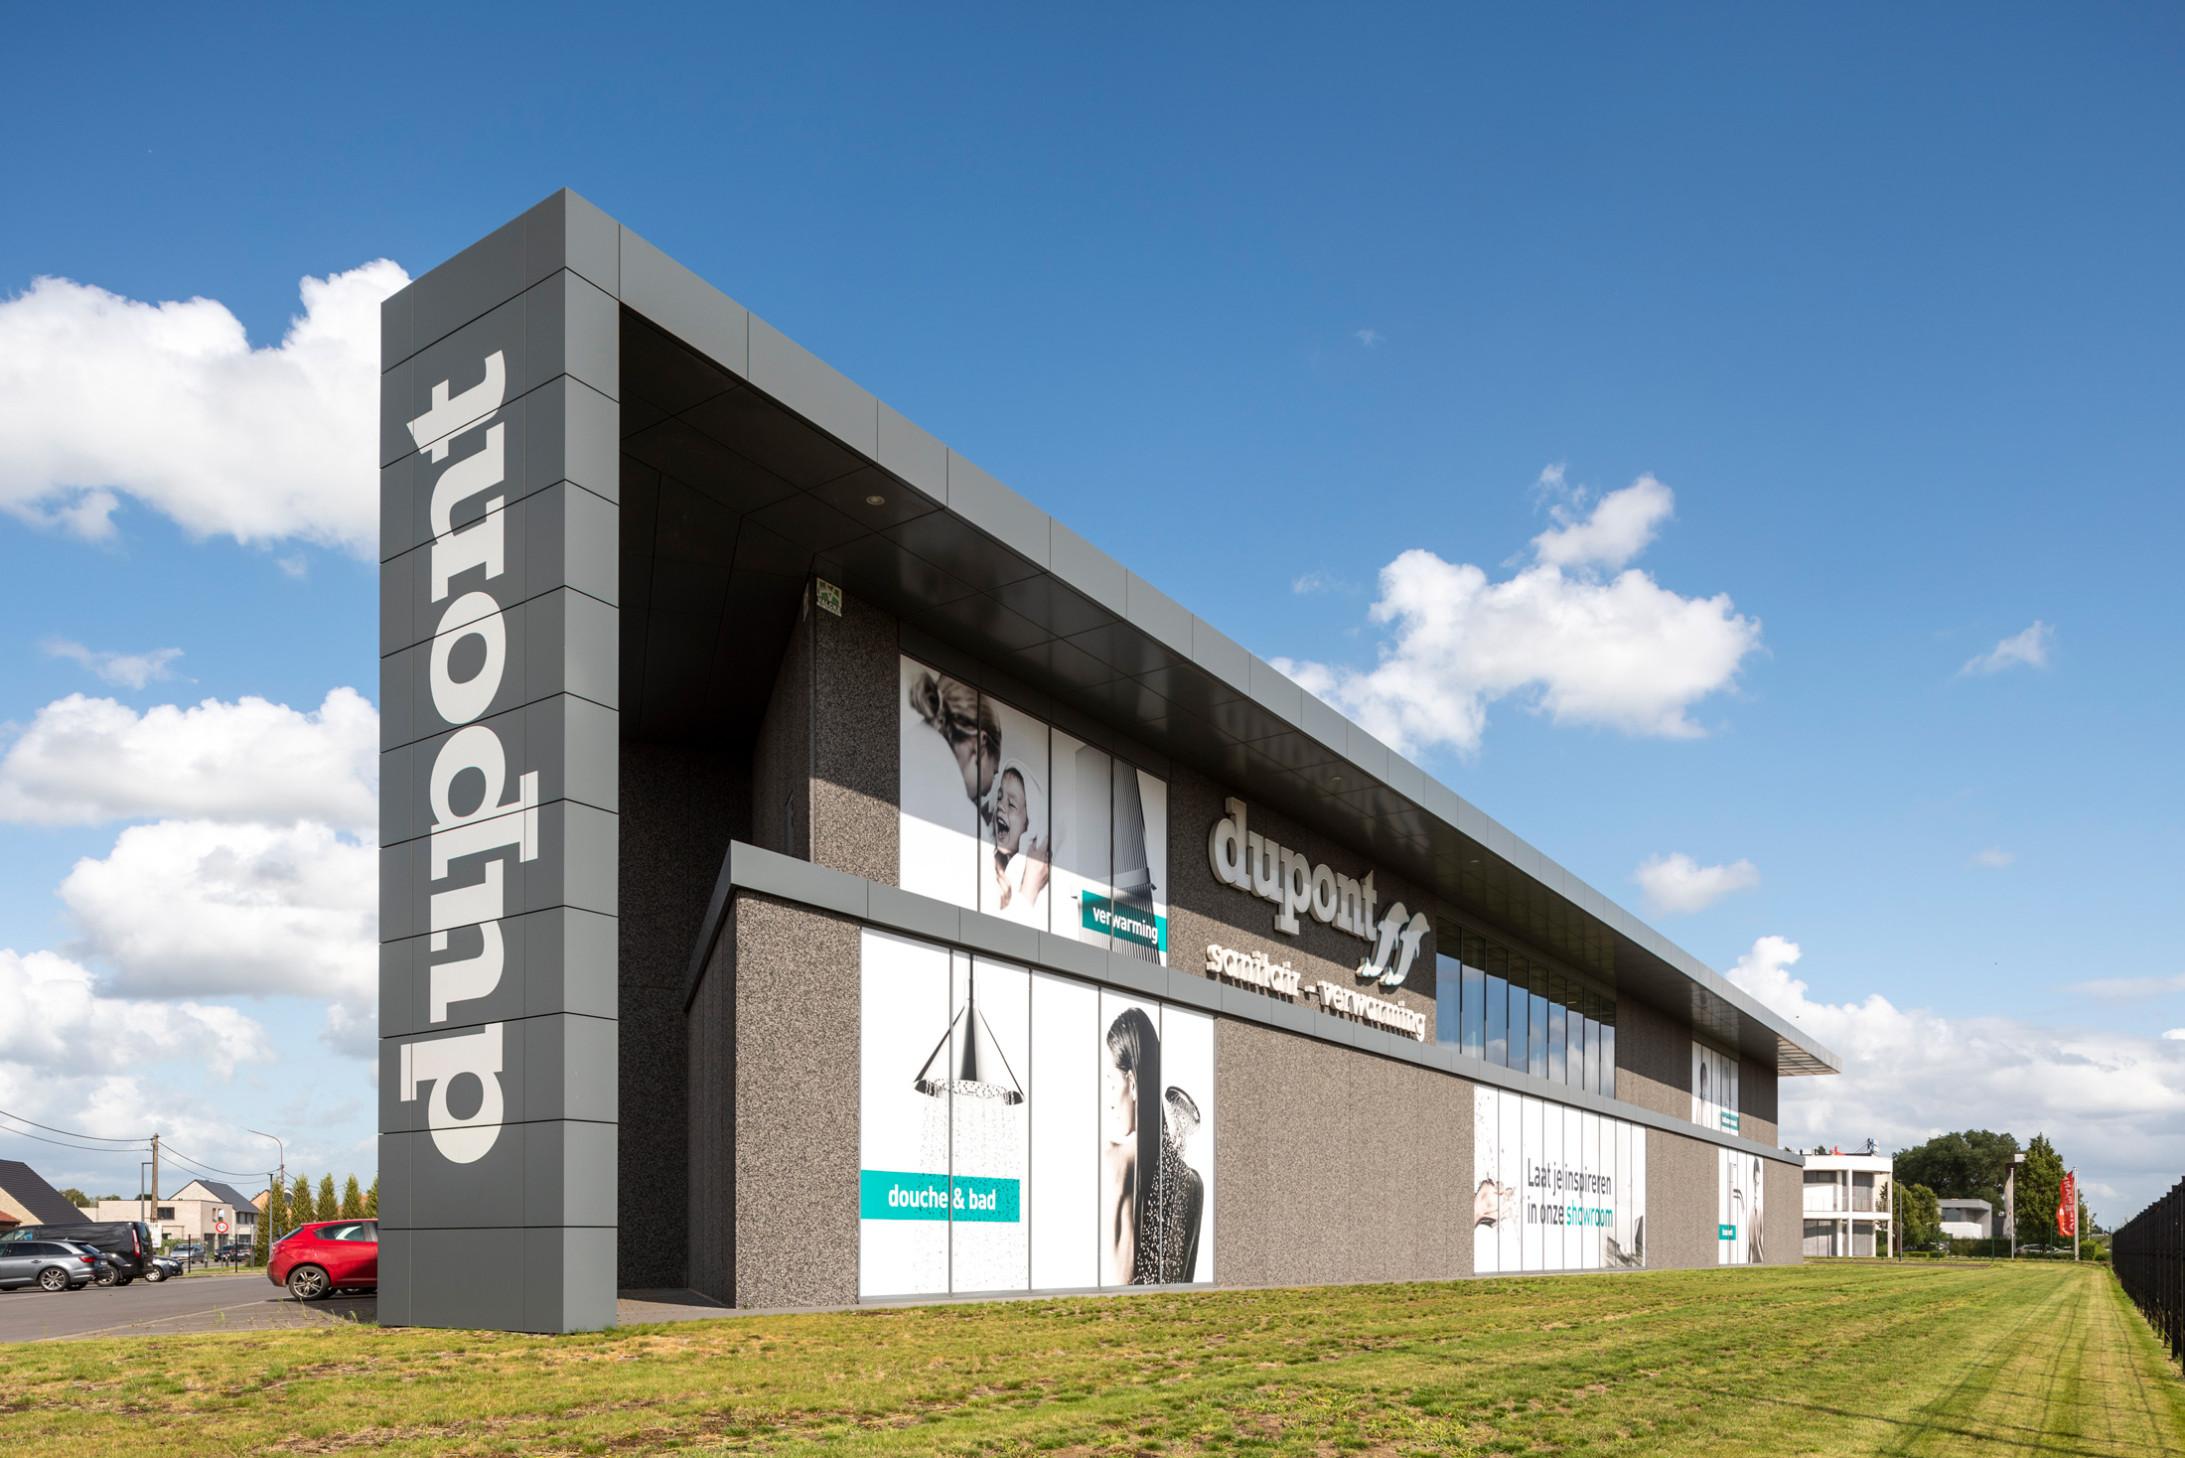 Winkelruimte Dupont4_Roeselare_Claeys Architecten